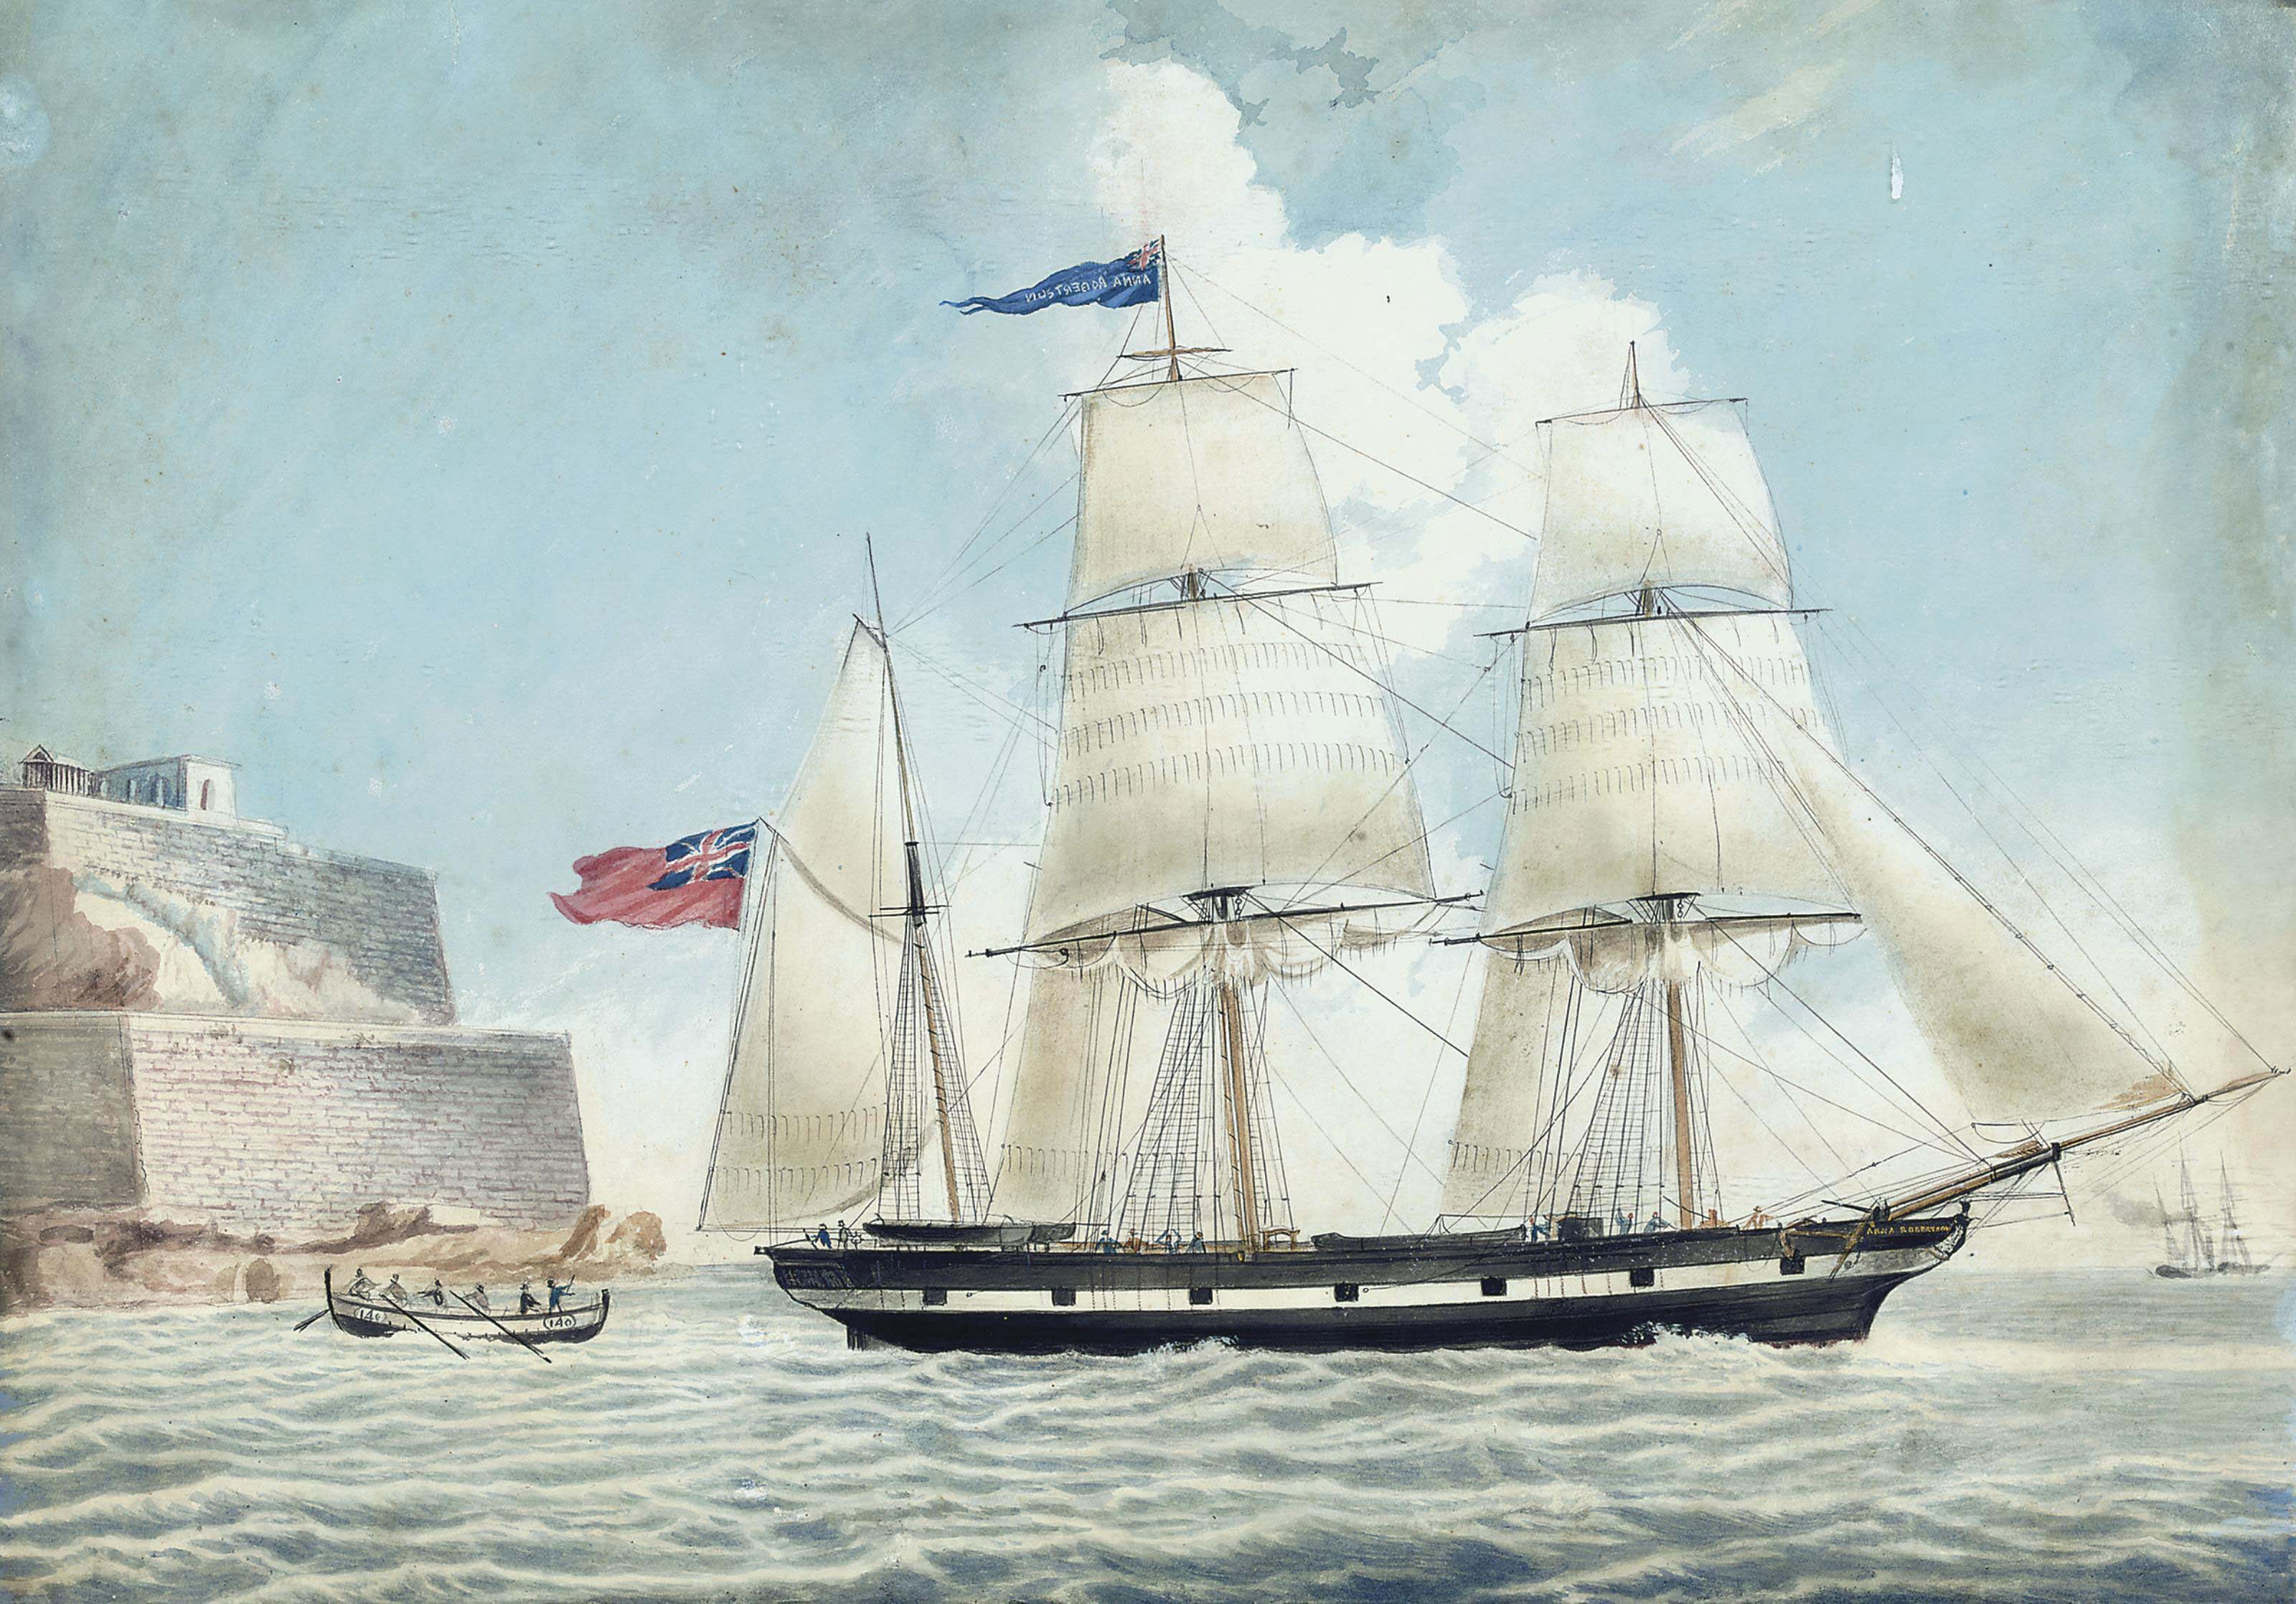 The British barque Anna Robertson of Scarborough leaving Malta